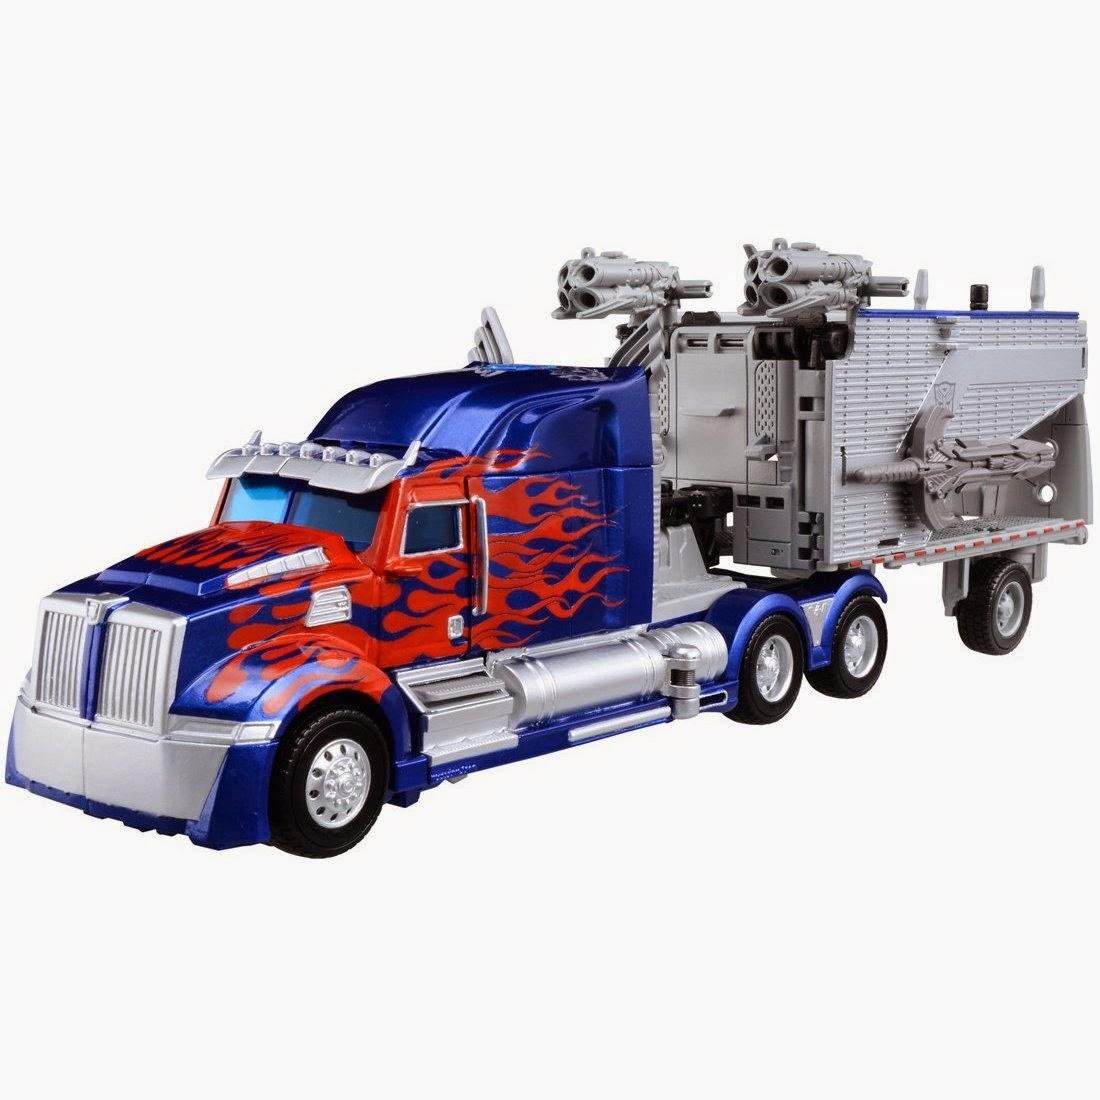 1100 x 1100 jpeg 125kBTransformers